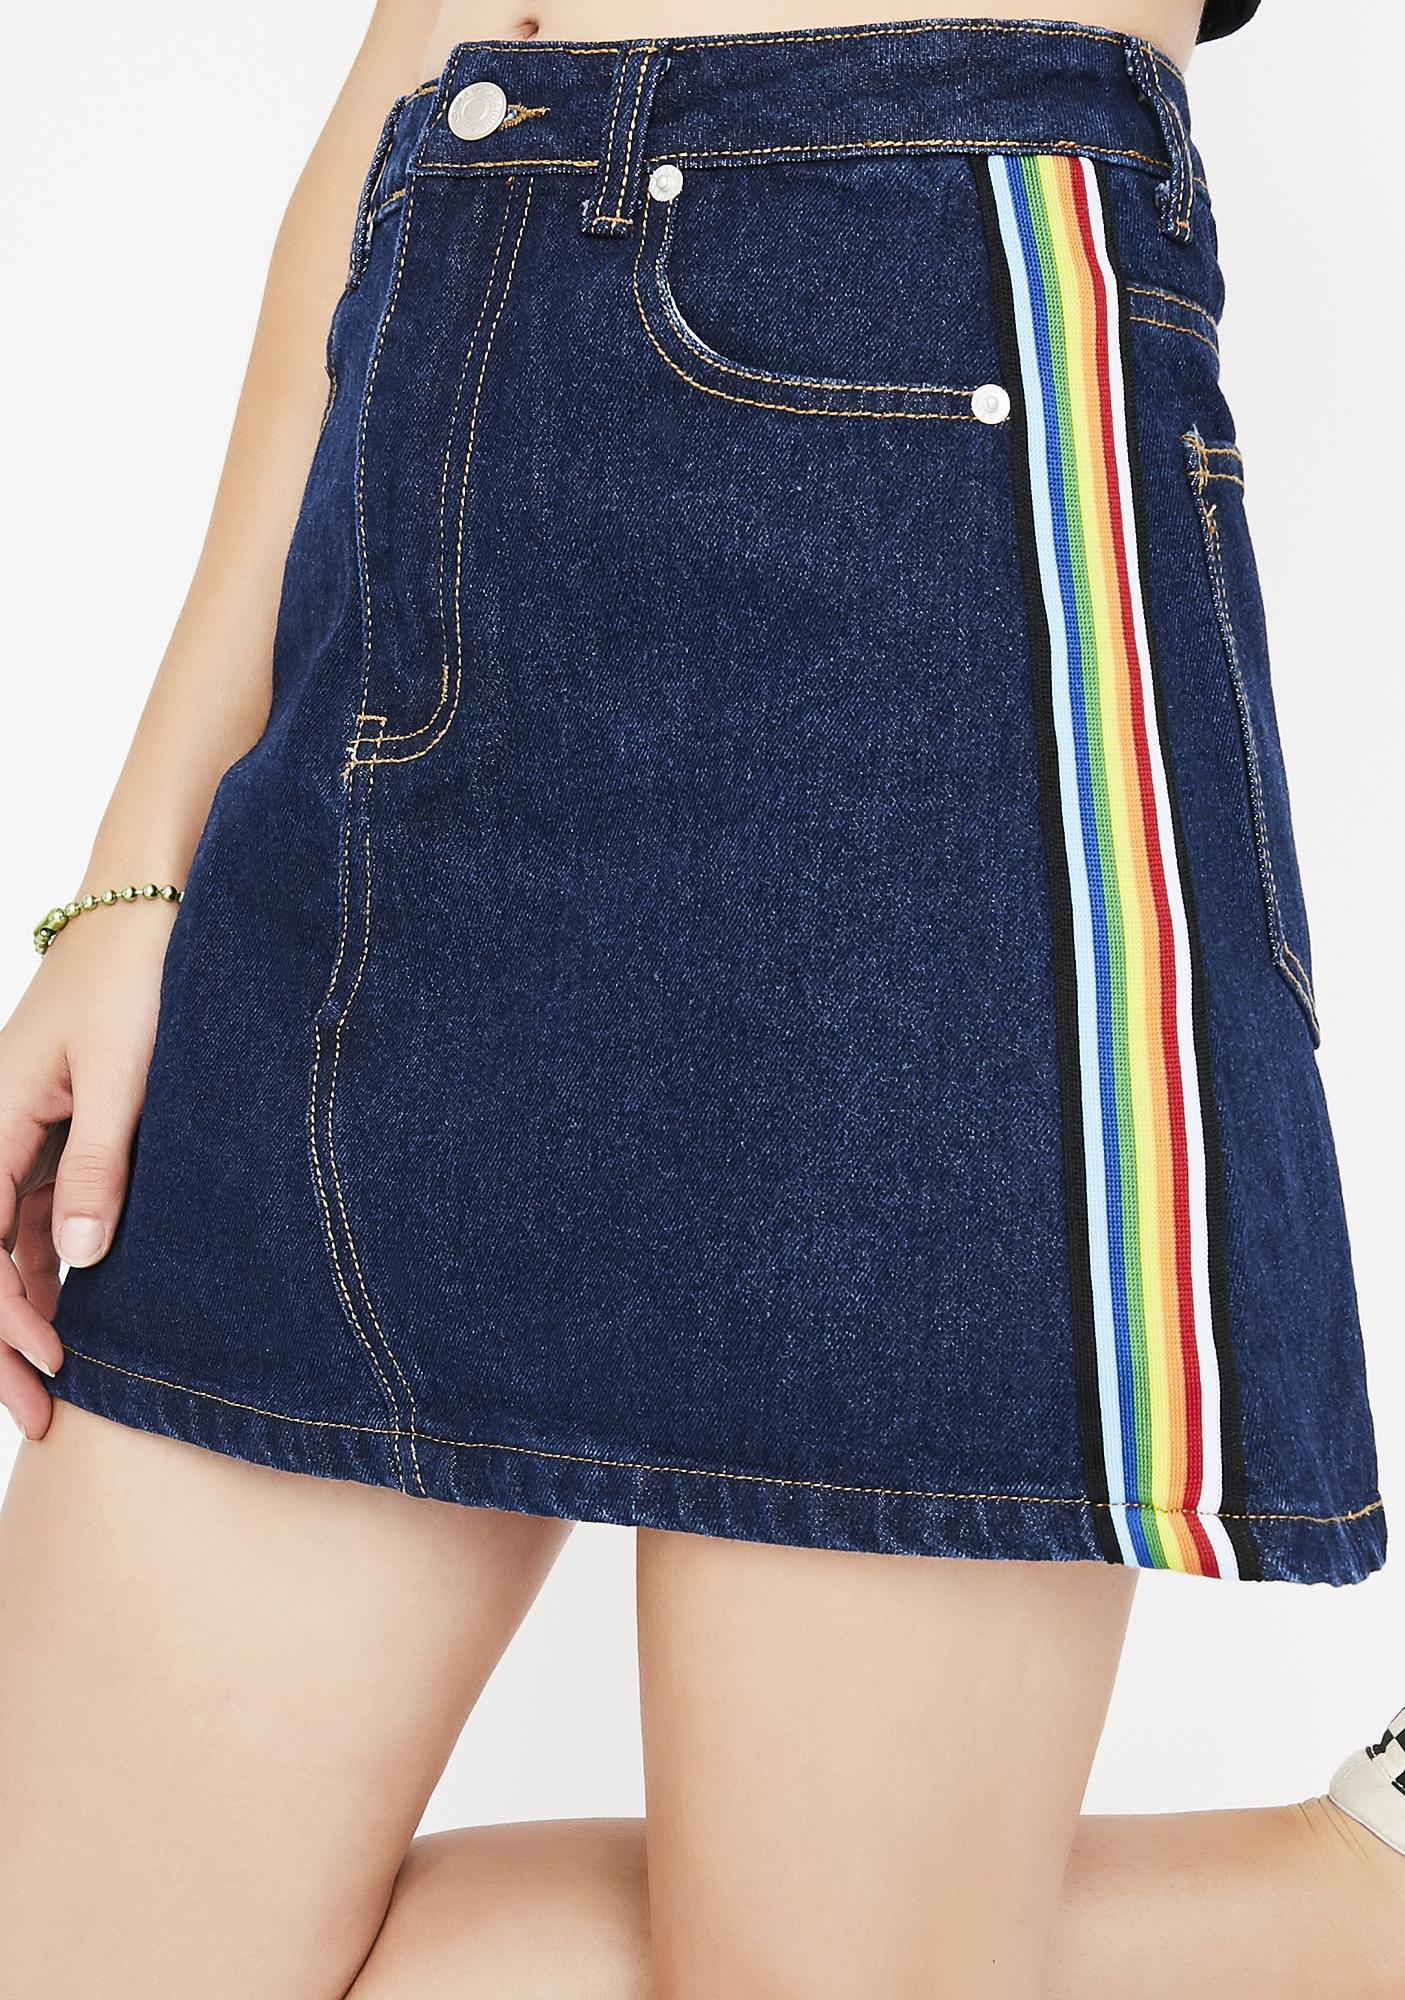 Follow My Rainbow Denim Skirt